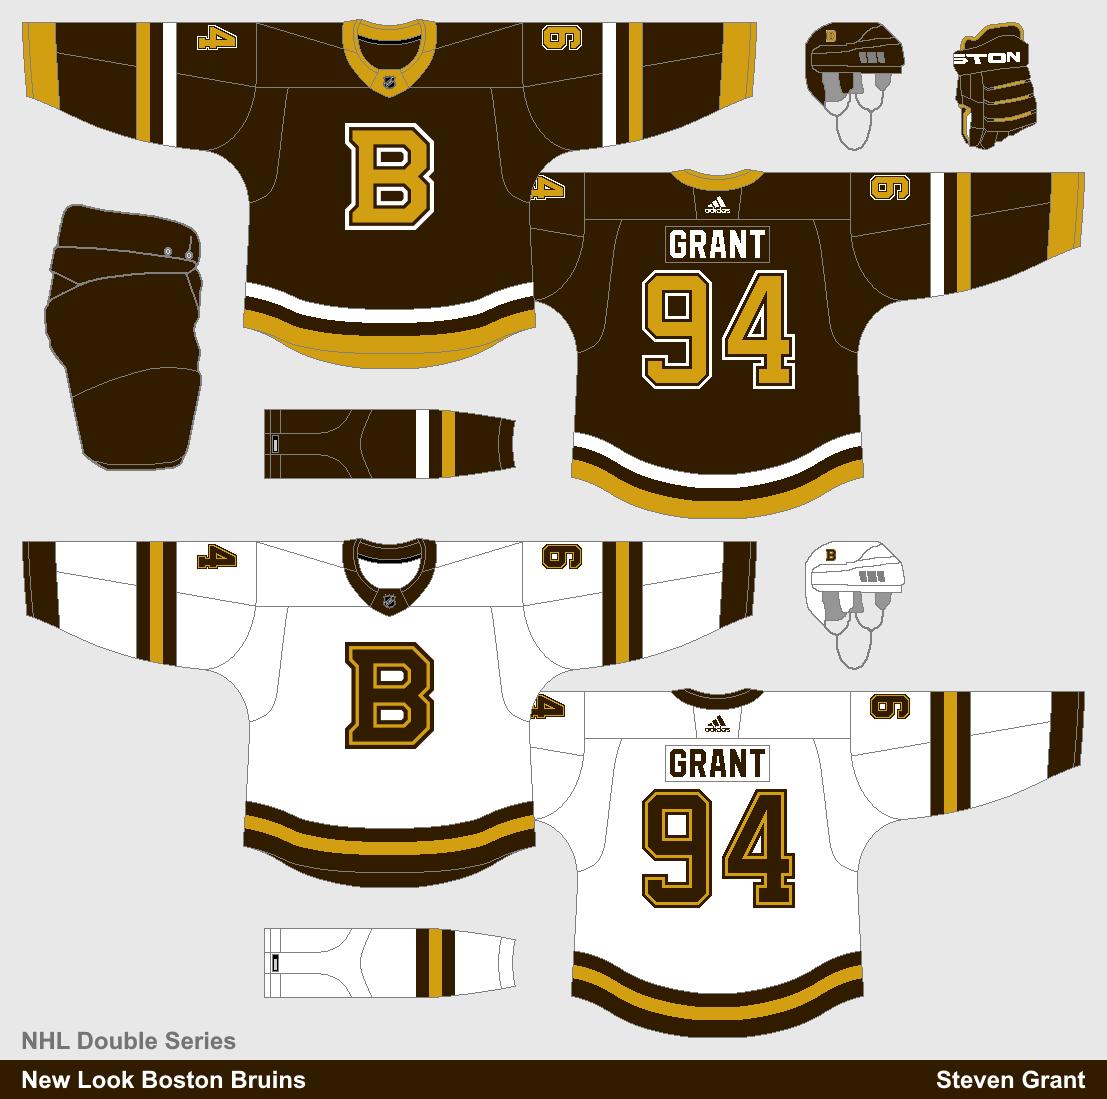 Niedlich Boston Bruins Logo Vorlage Fotos - Entry Level Resume ...